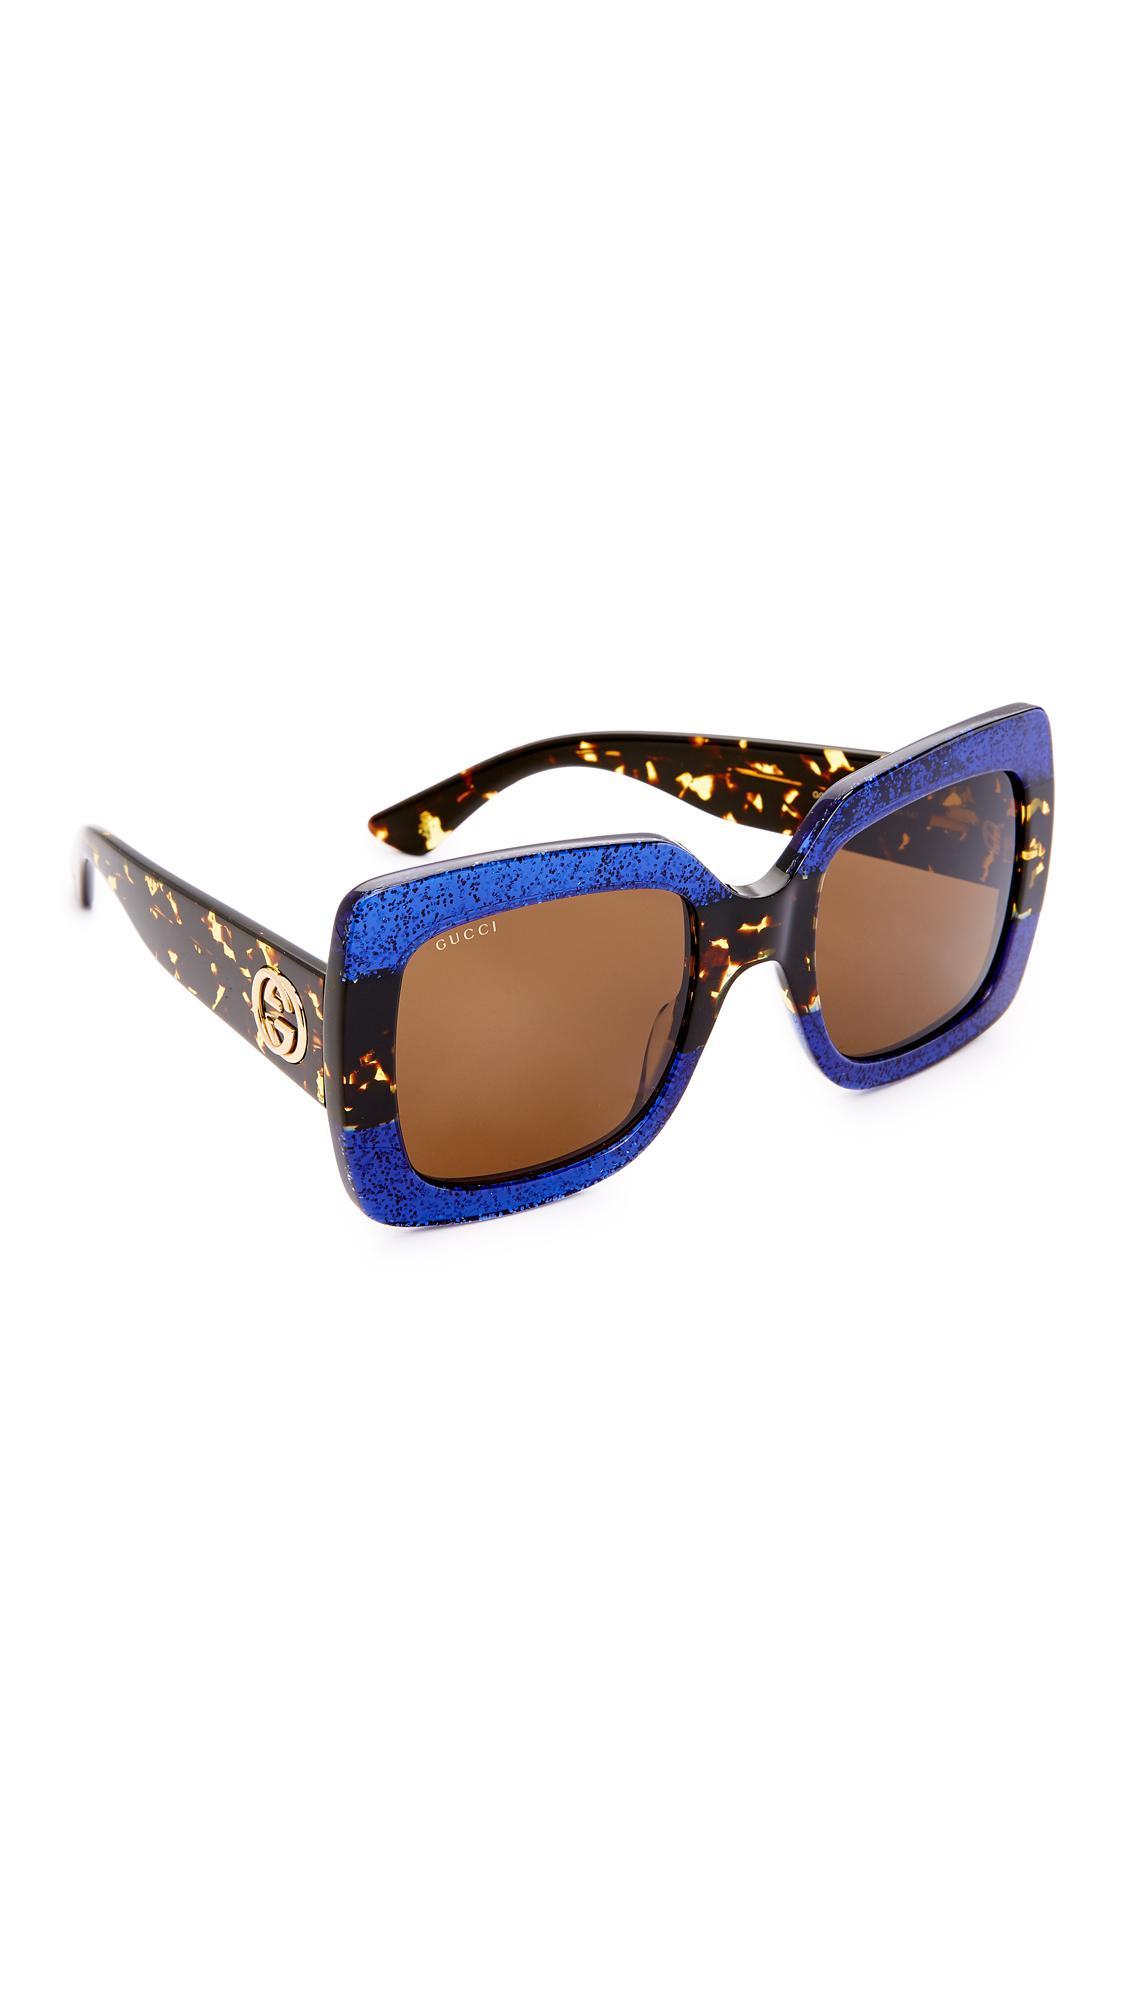 c62929496063 Gucci - Blue Square Urban Web Block Sunglasses - Lyst. View fullscreen